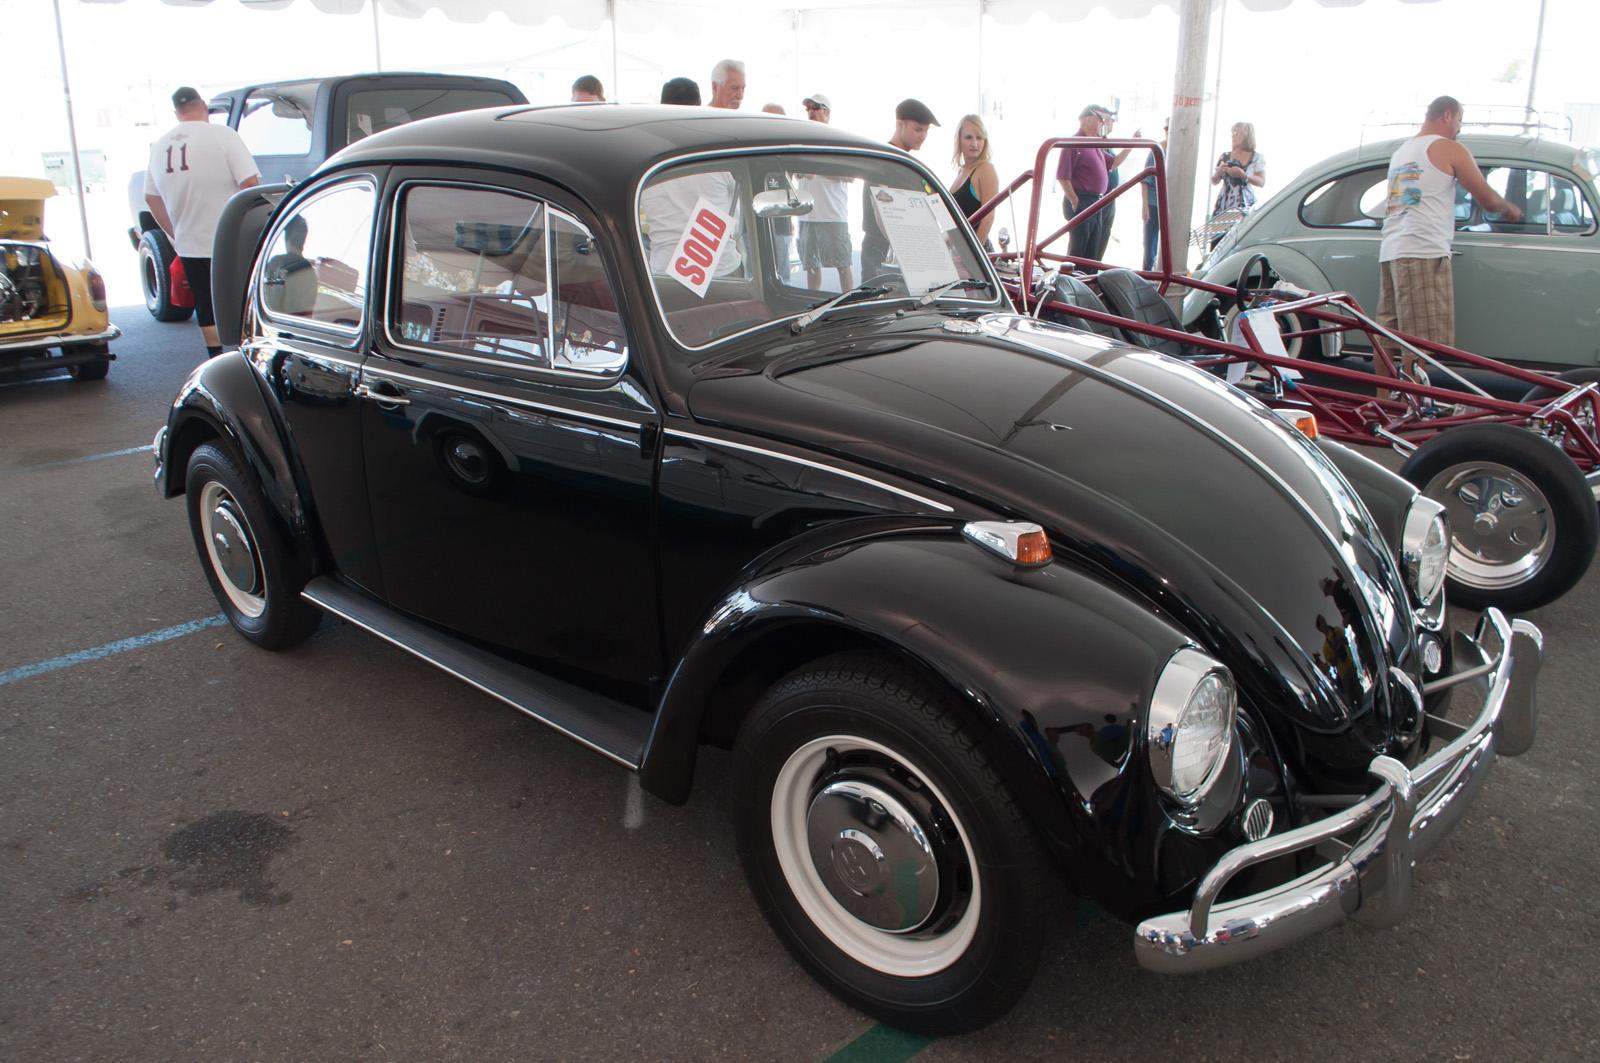 Description 1967 Volkswagen Beetle - Flickr - skinnylawyer.jpg